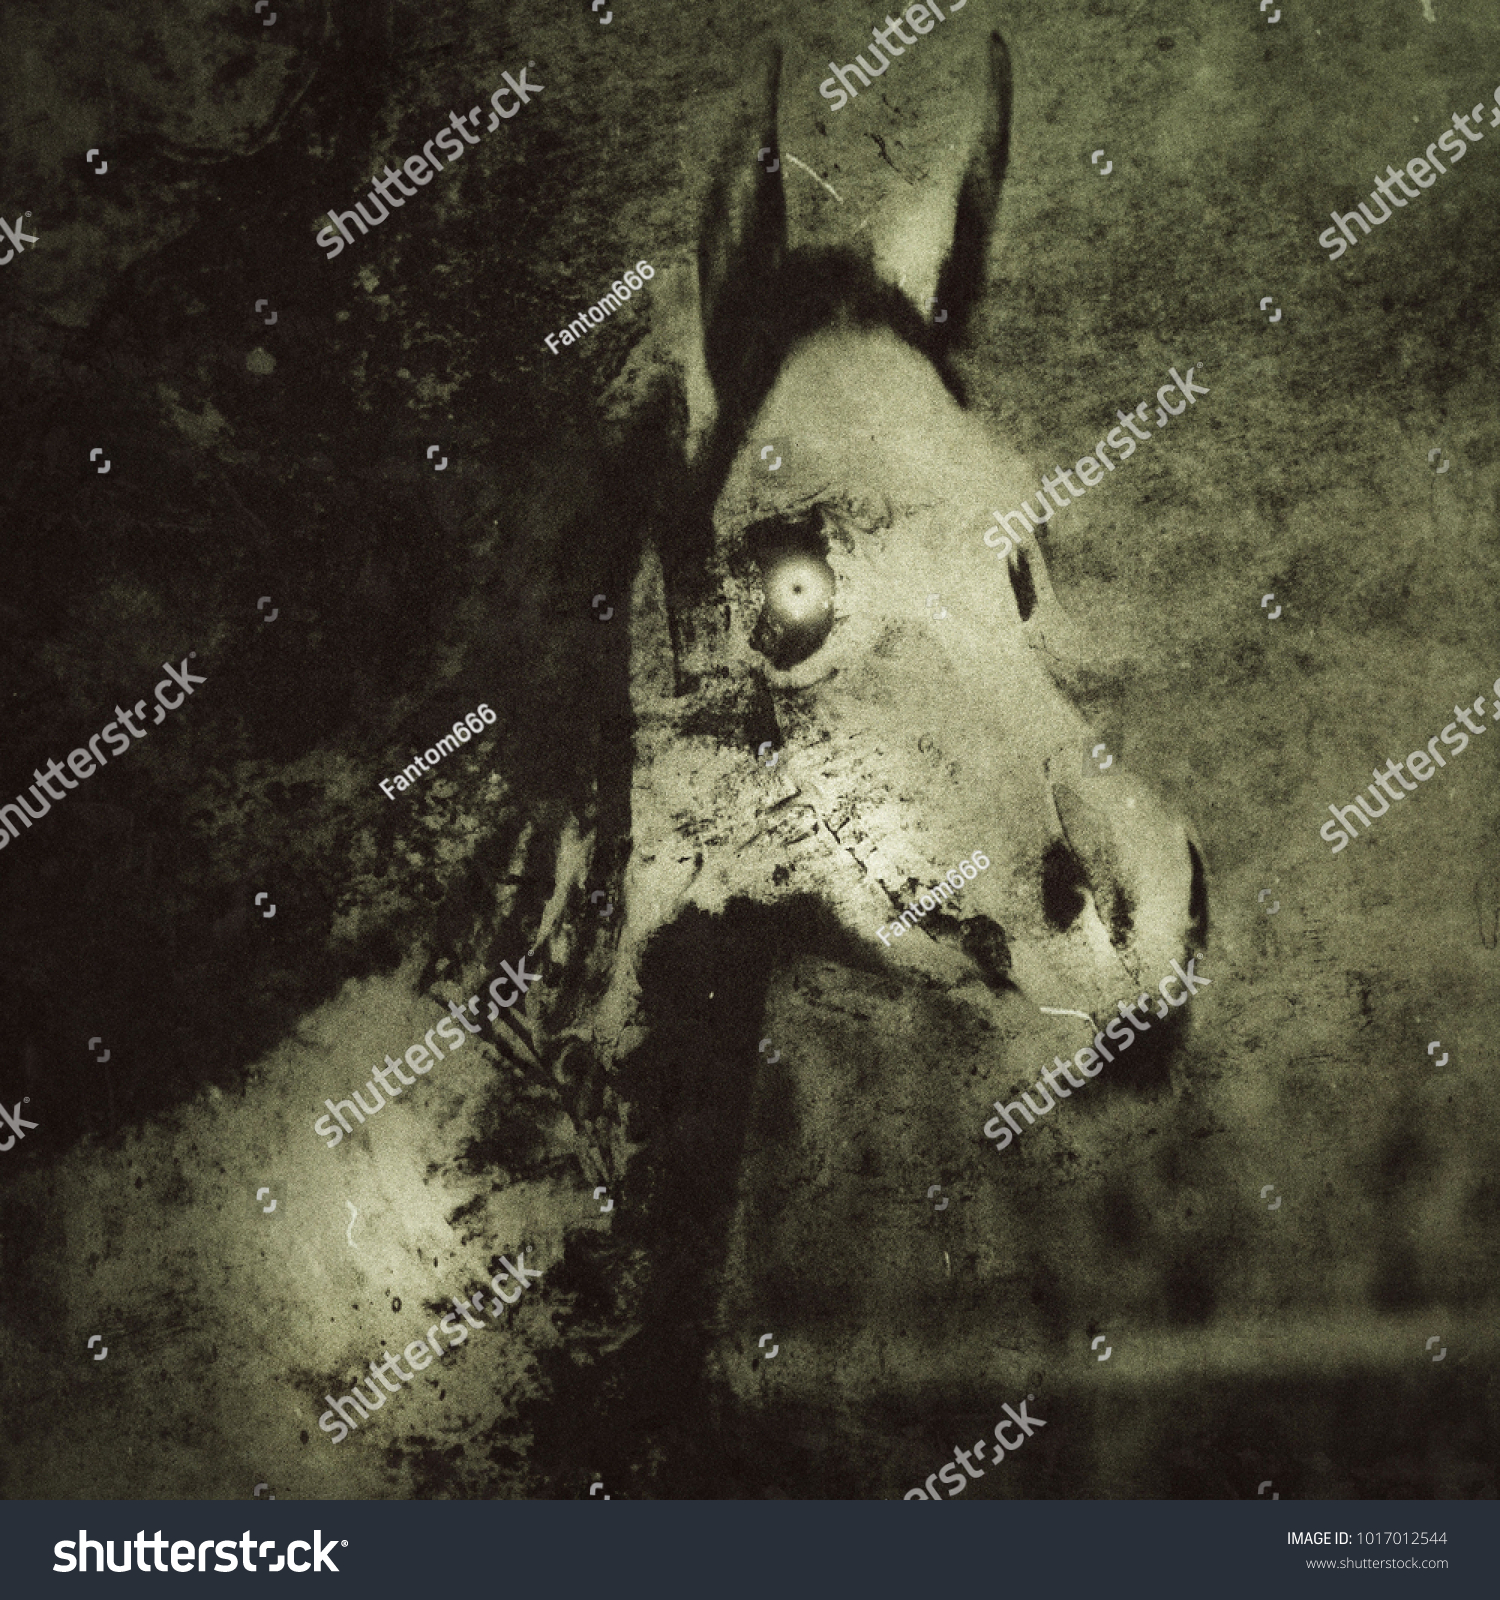 Horse Skull Spooky Horror Wallpaper Scary 1017012544